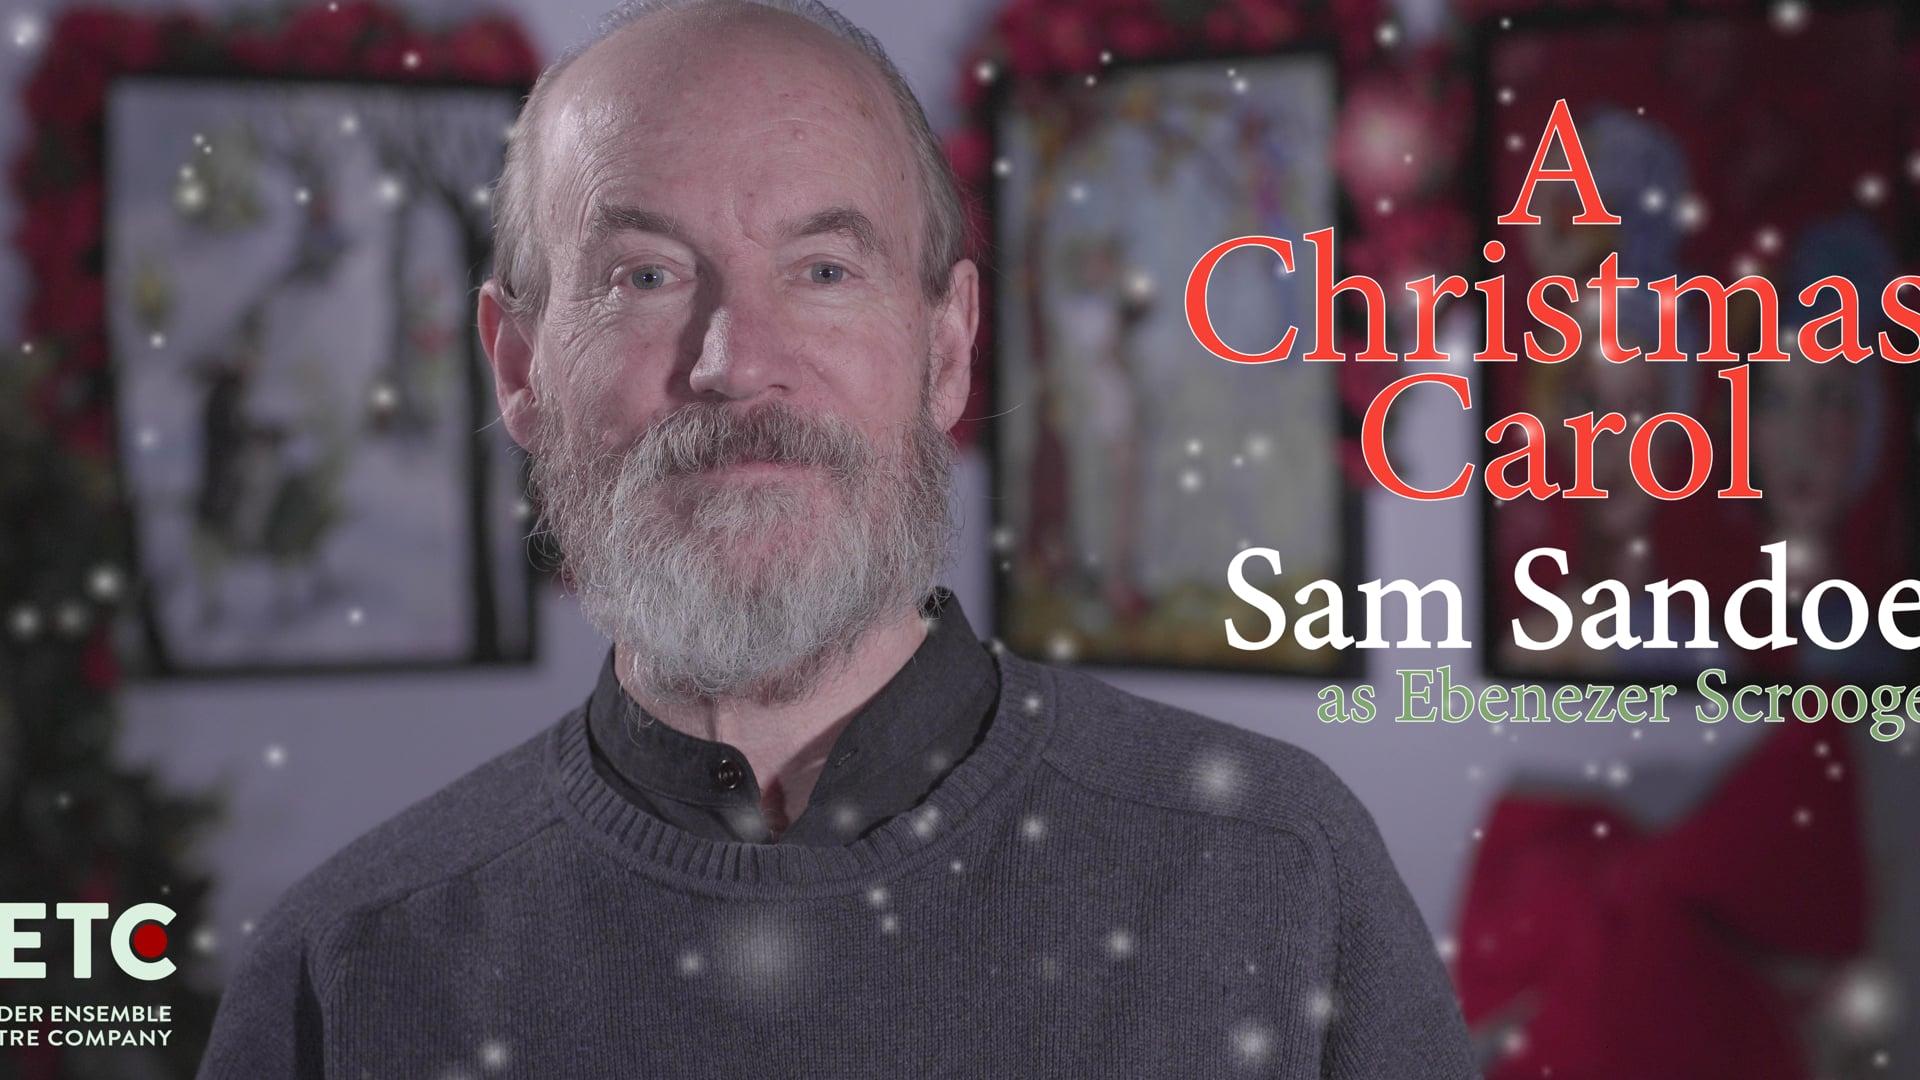 BETC - Christmas